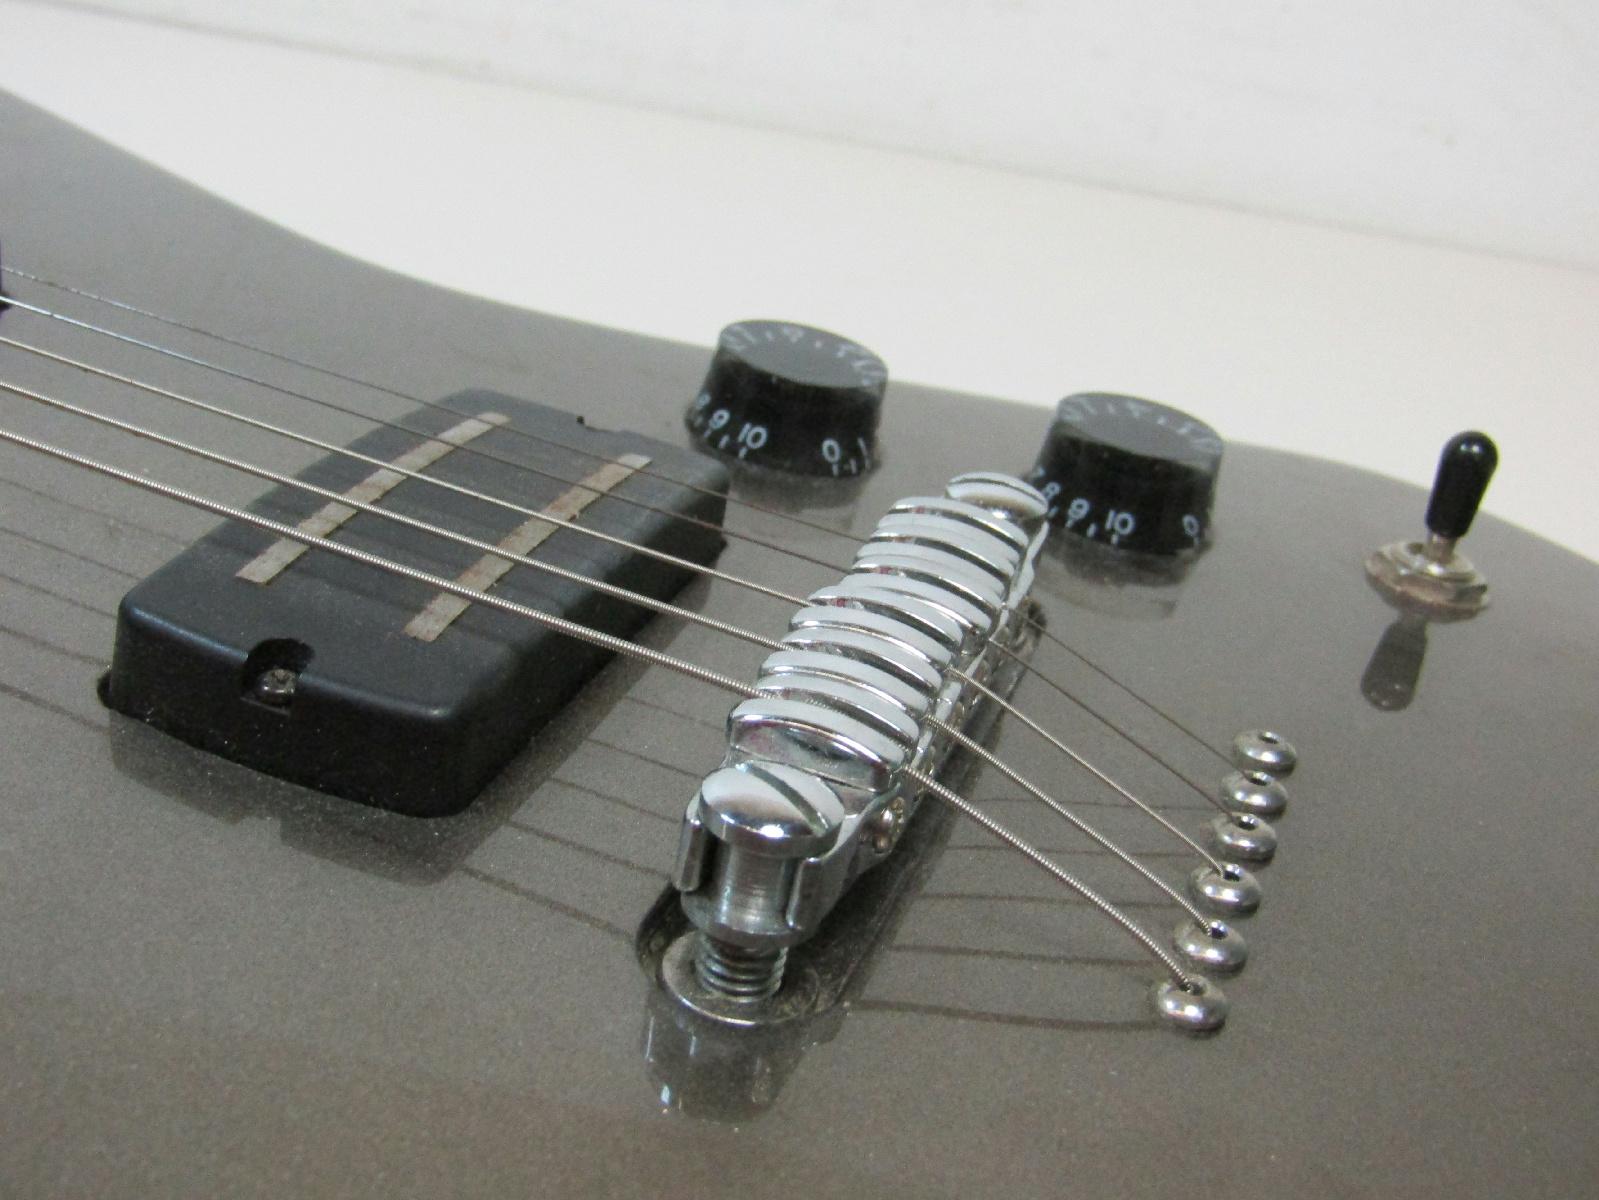 ibanez electric guitar destroyer iceman type body parts. Black Bedroom Furniture Sets. Home Design Ideas